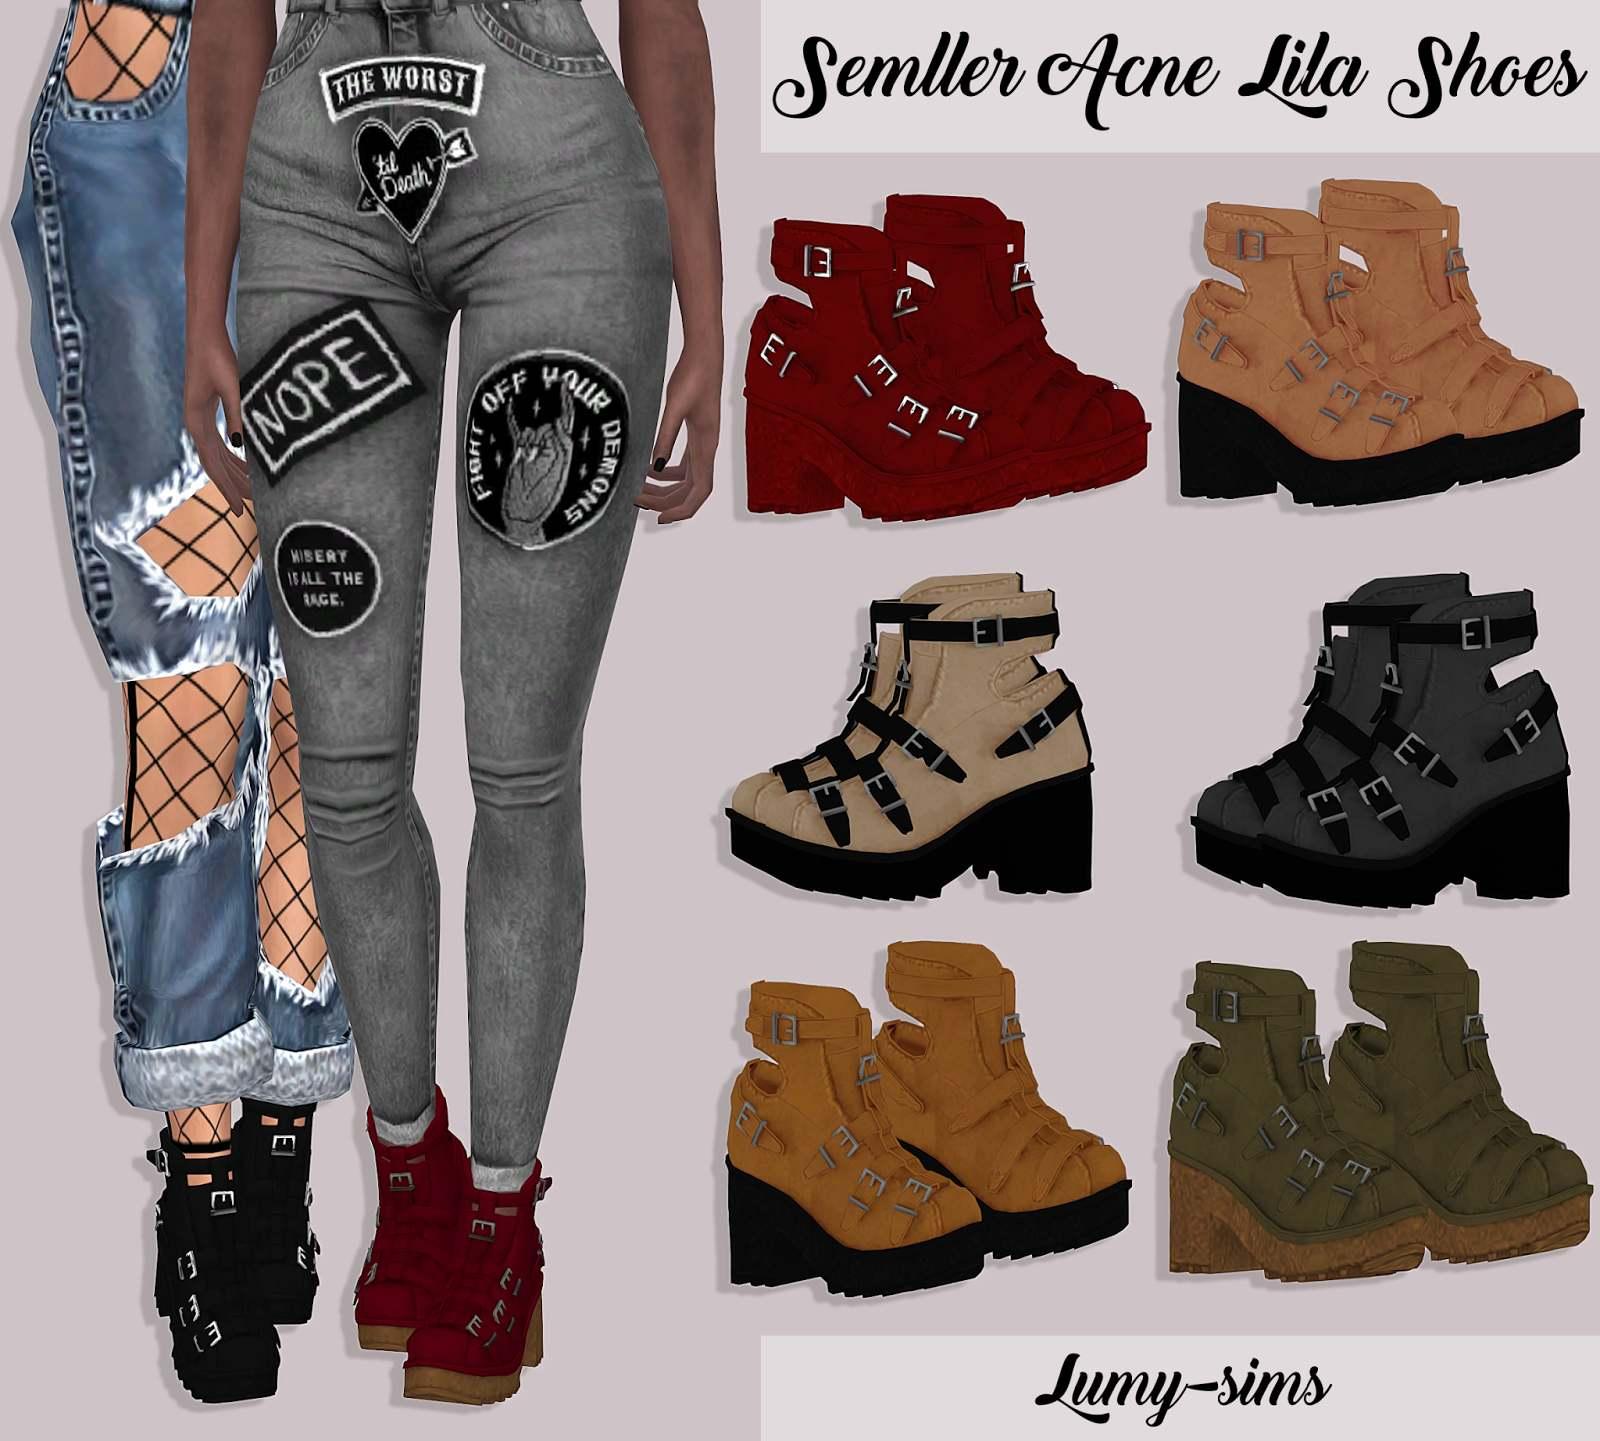 Ботильоны - Semller Acne Lila Shoes